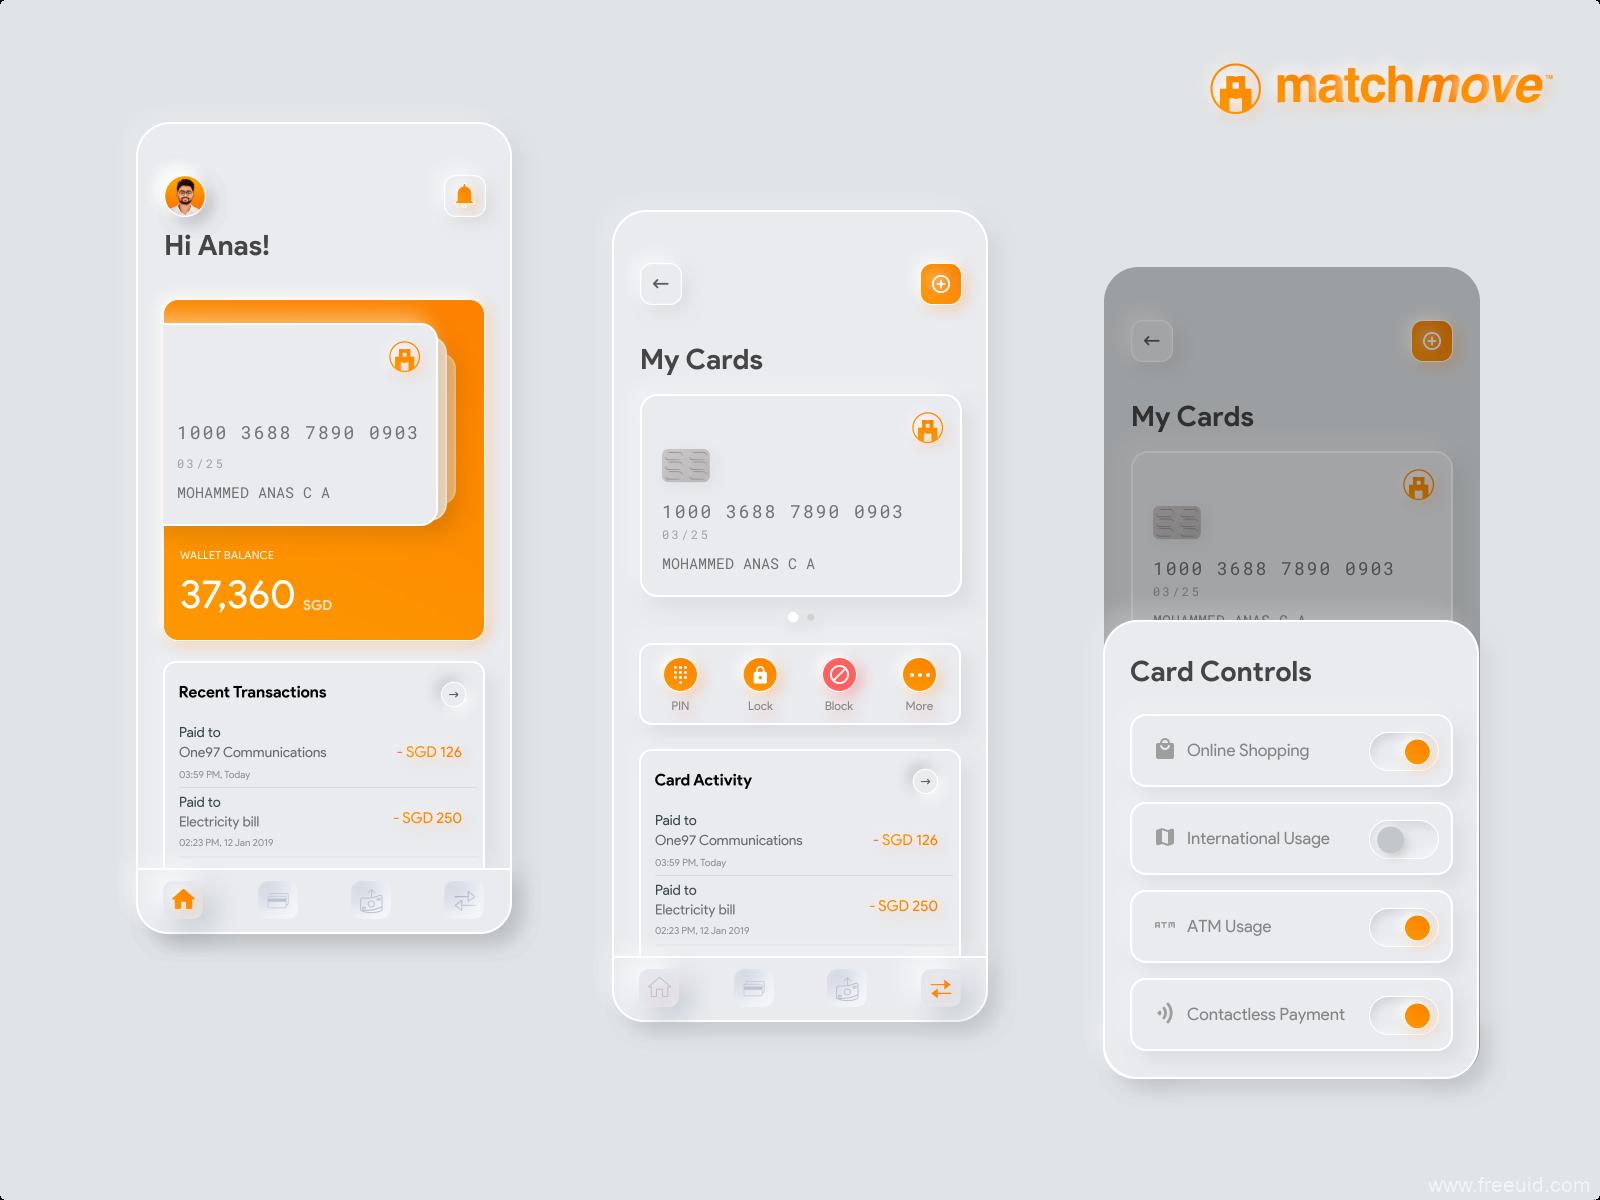 [UI Kit]新拟物轻质感Neumorphic风格金融app ui素材设计 | 源文件 .sketch下载插图-泛设计